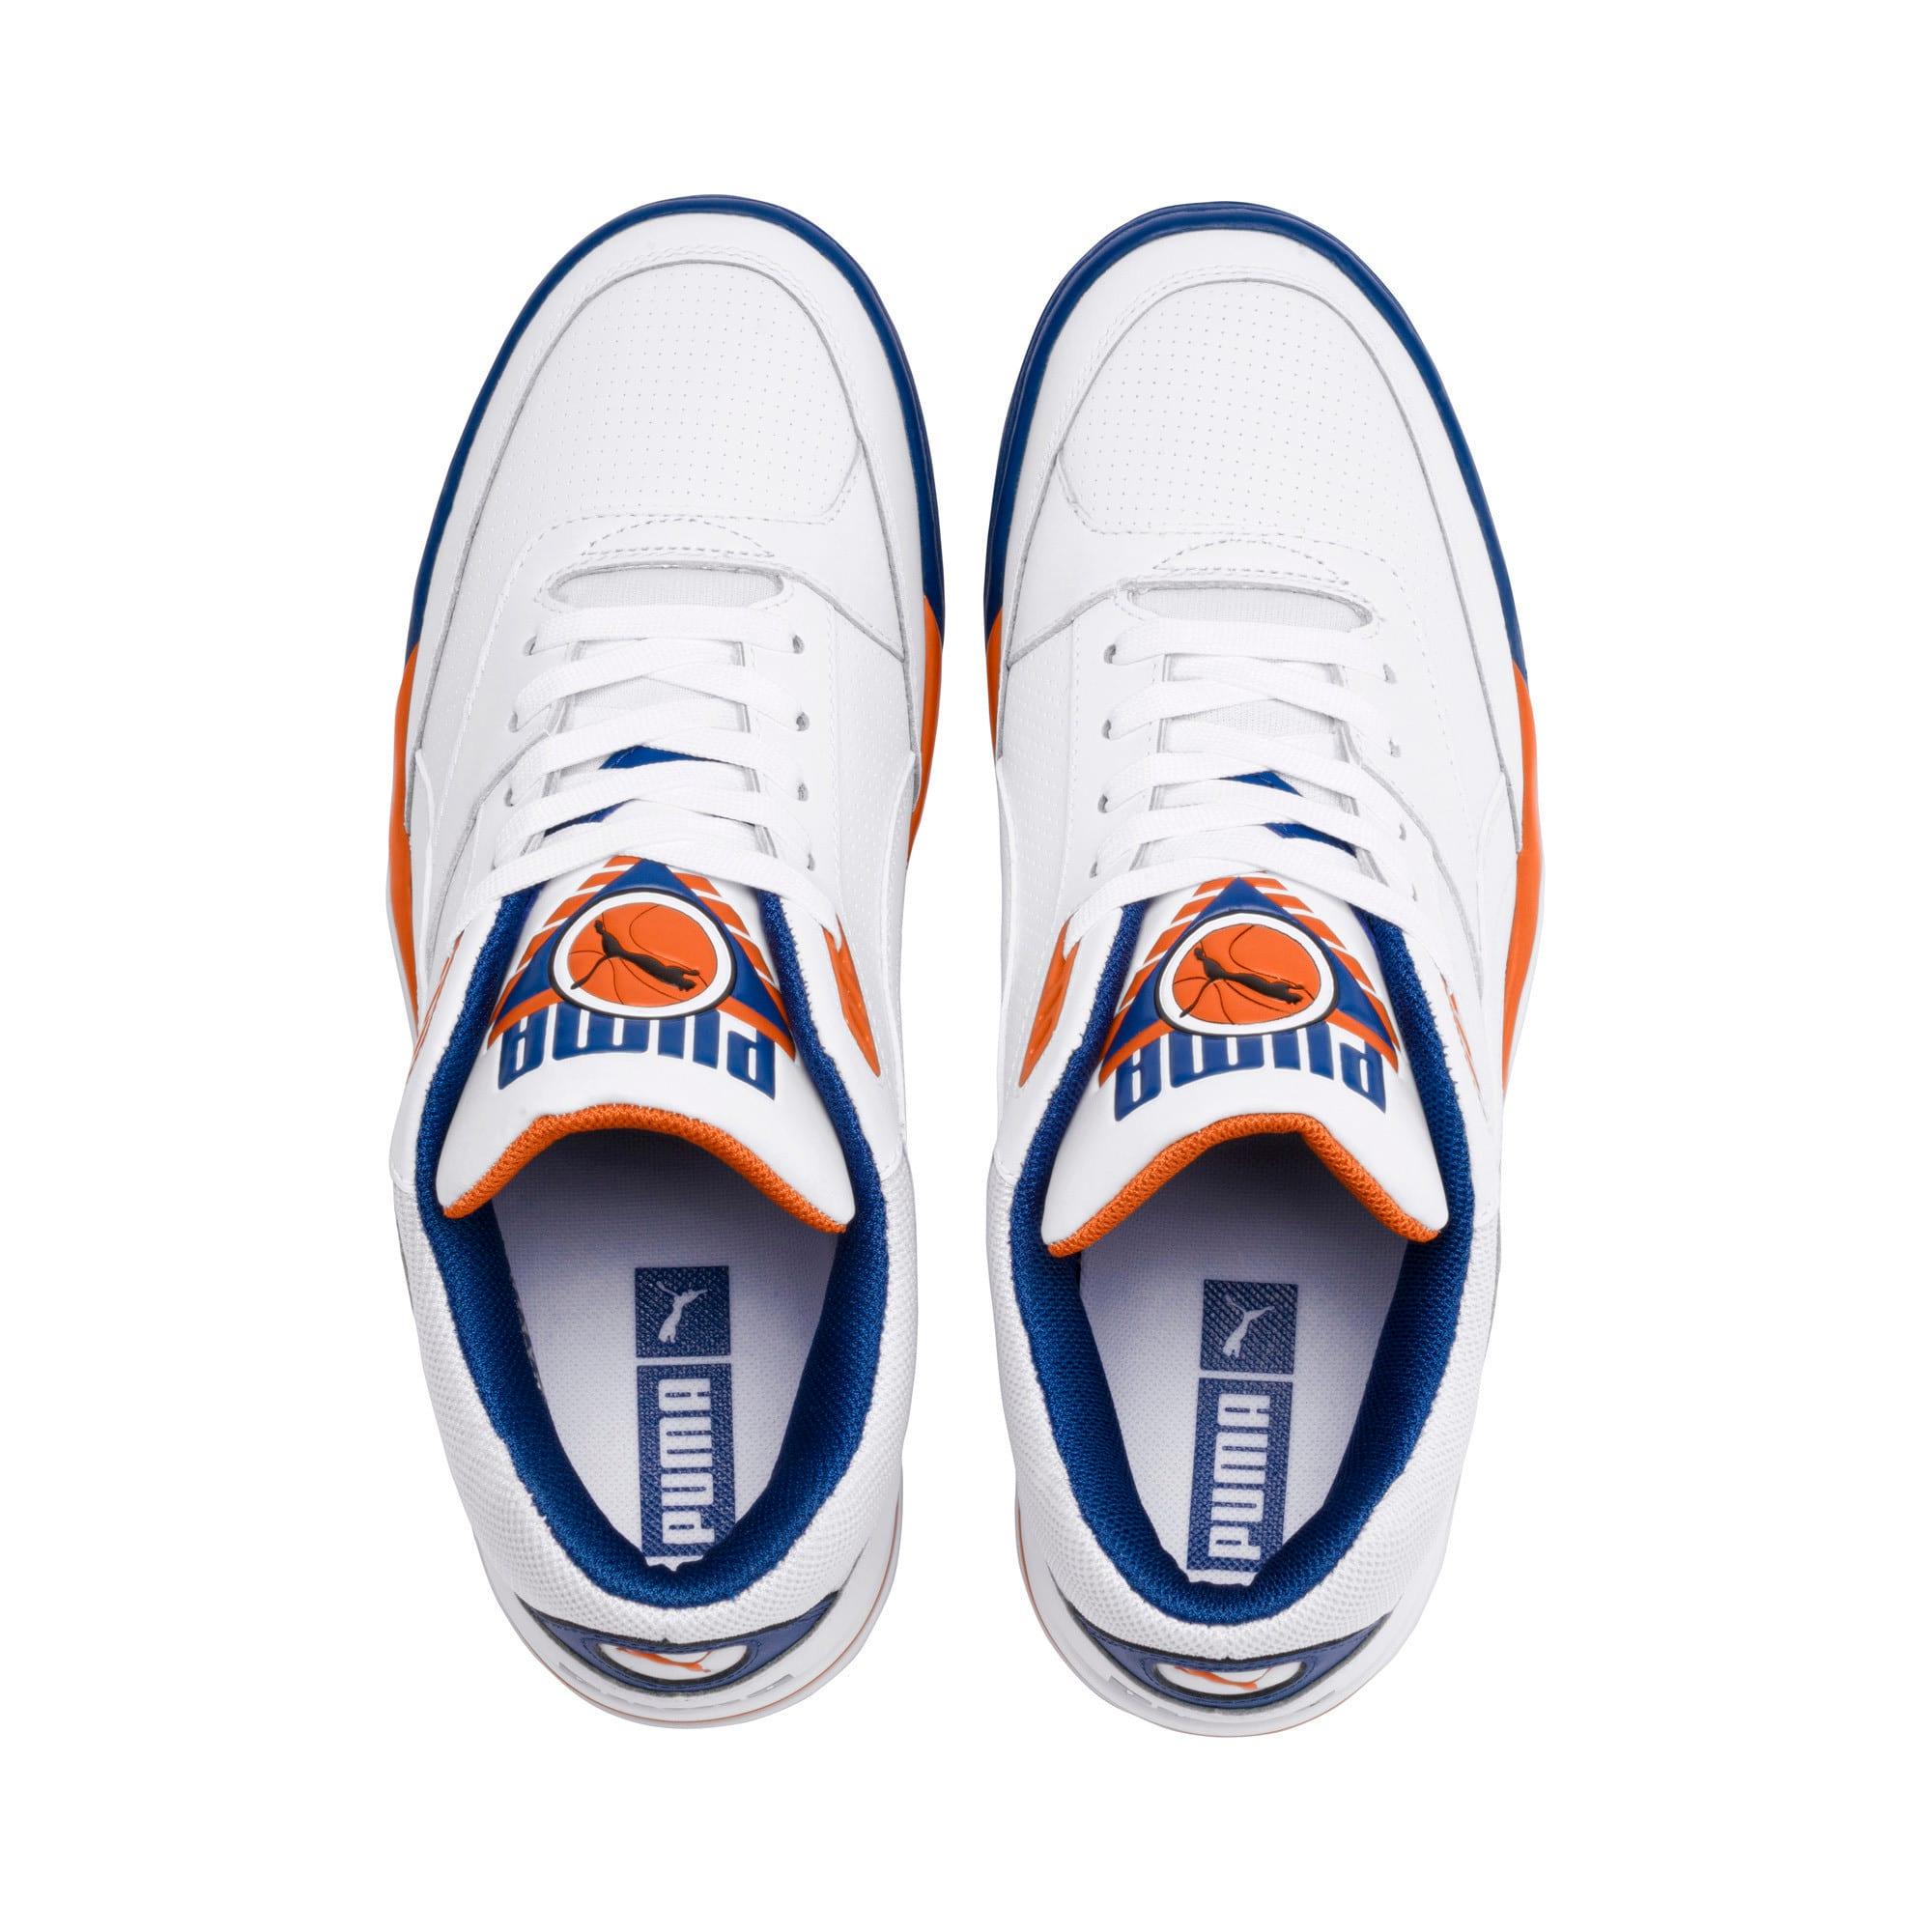 Imagen en miniatura 6 de Zapatillas de baloncesto de hombre Palace Guard, P White-Jaffa Orange-G Blue, mediana